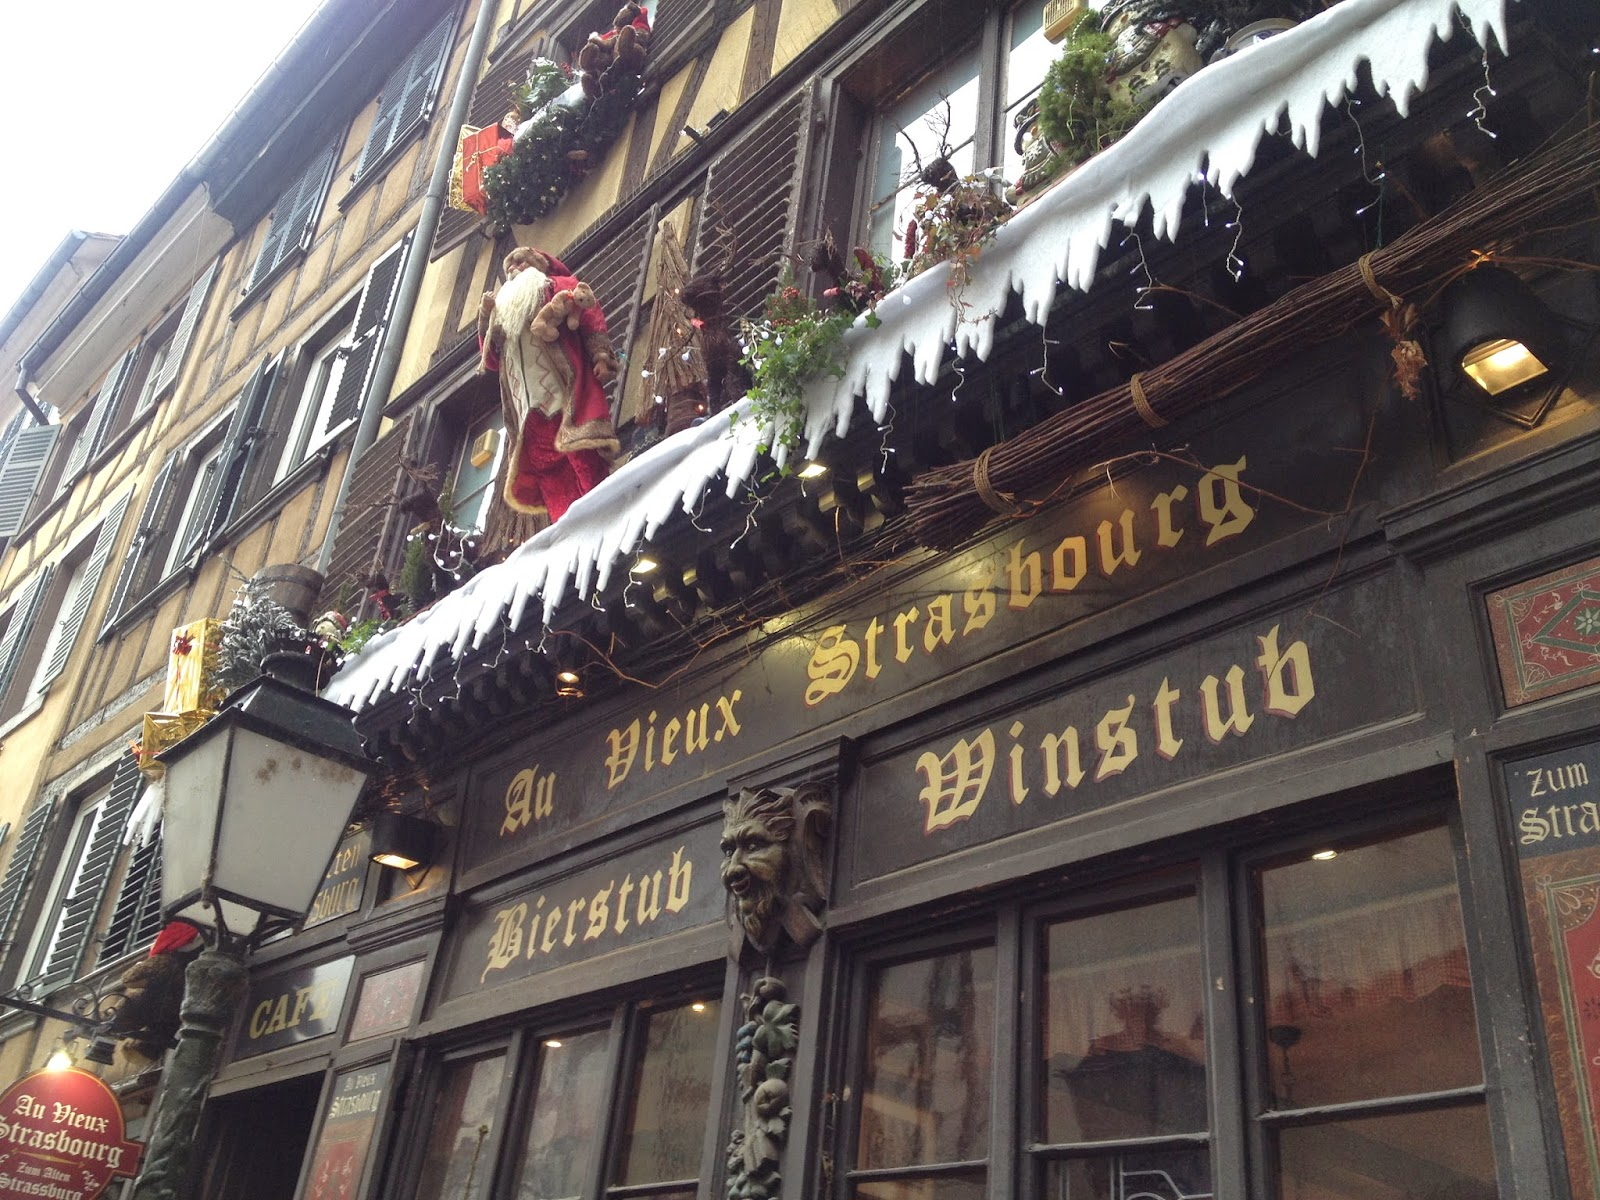 Au Vieux Strasbourg, Strasbourg, France